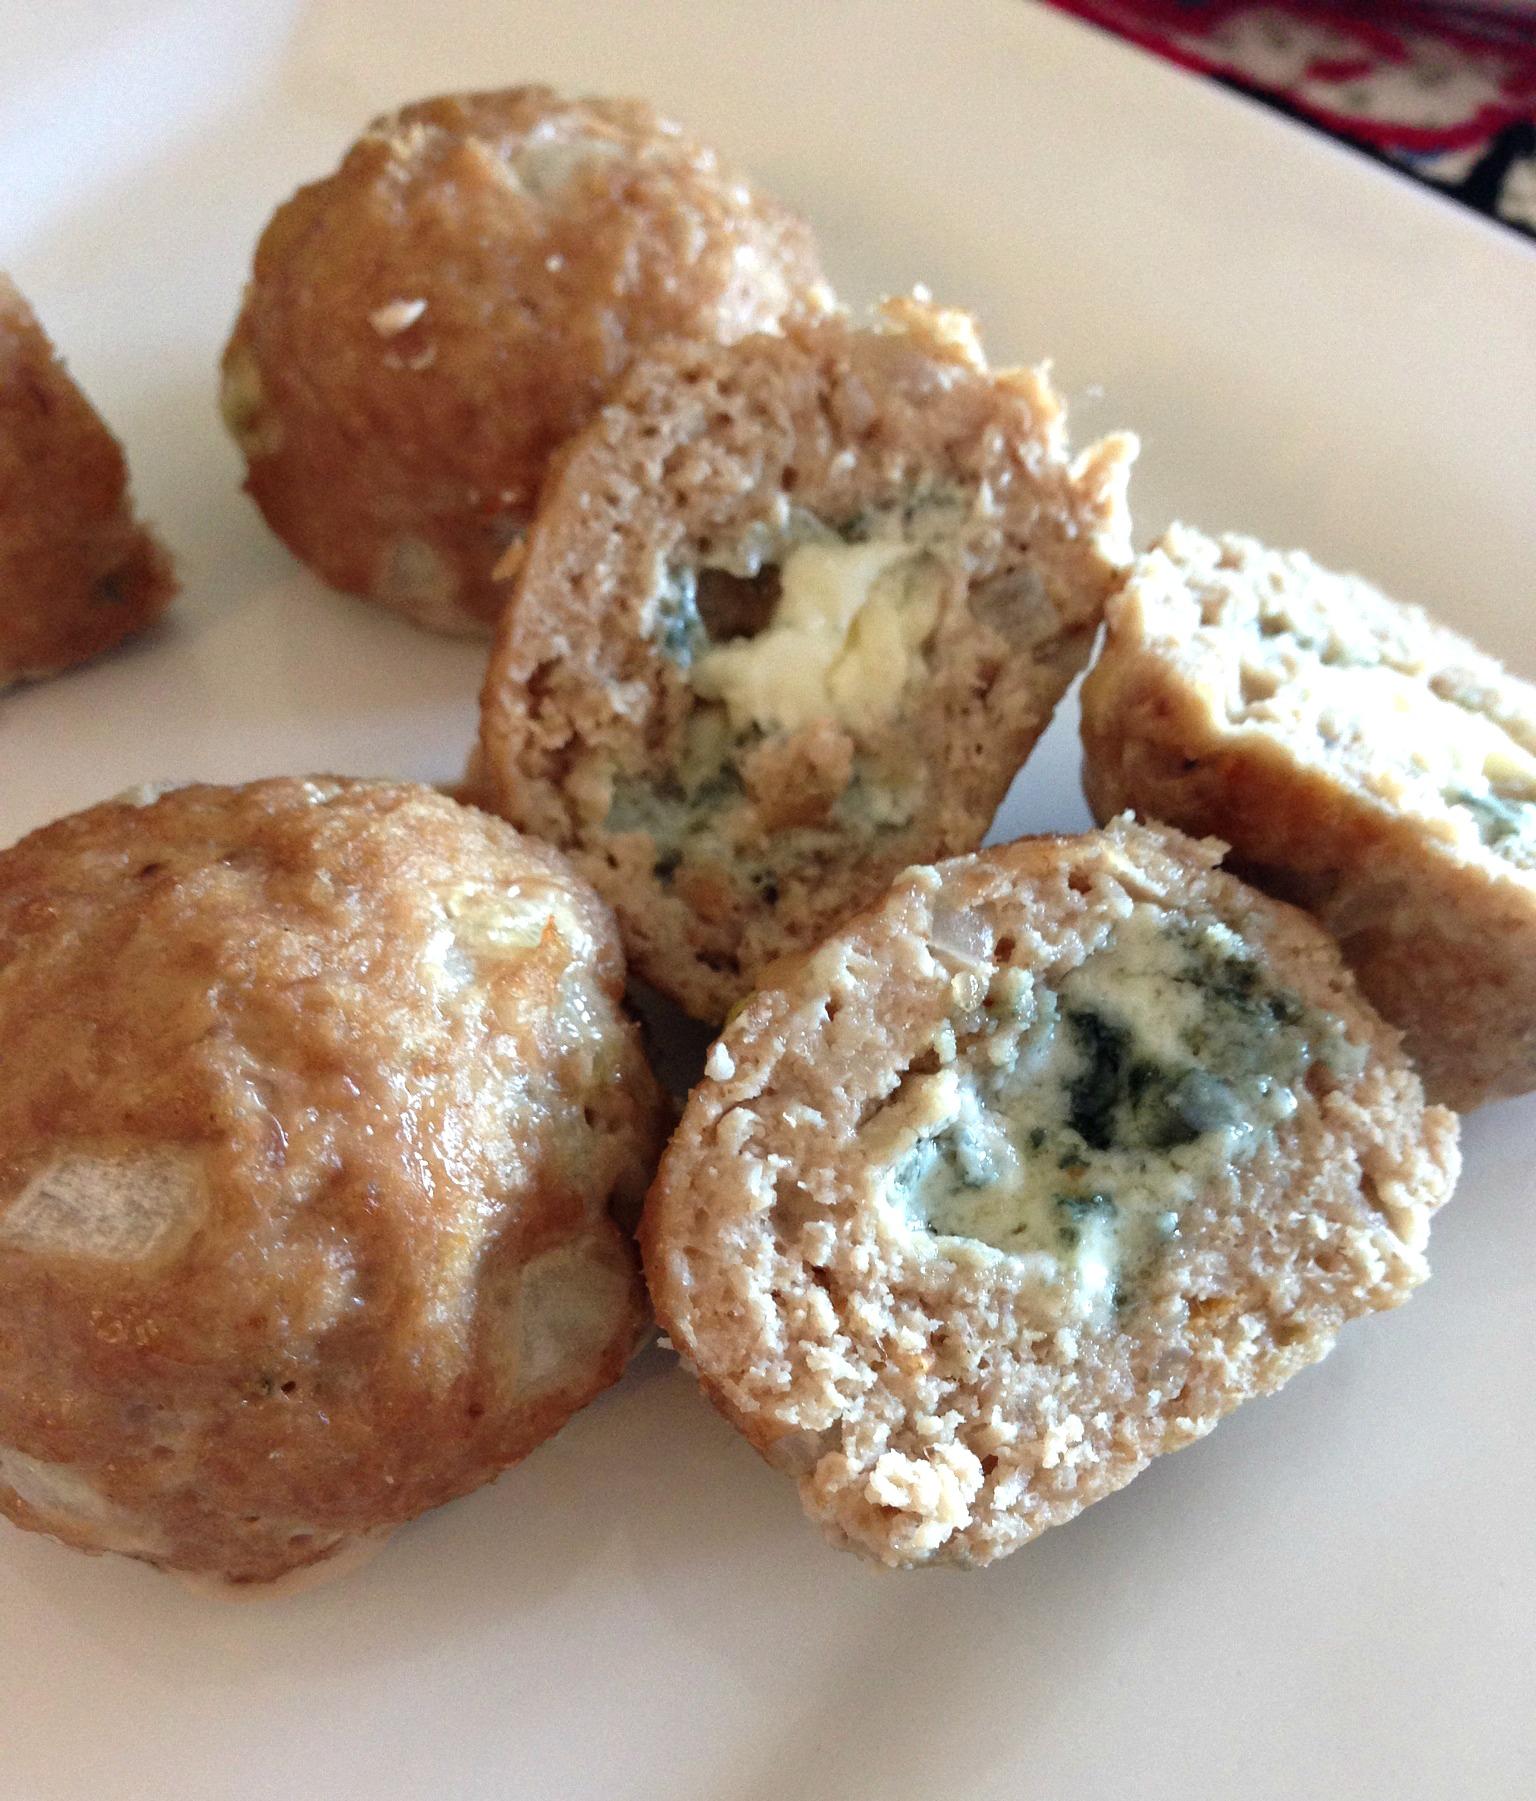 Blue Cheese stuffed Mini Turkey Meatballs